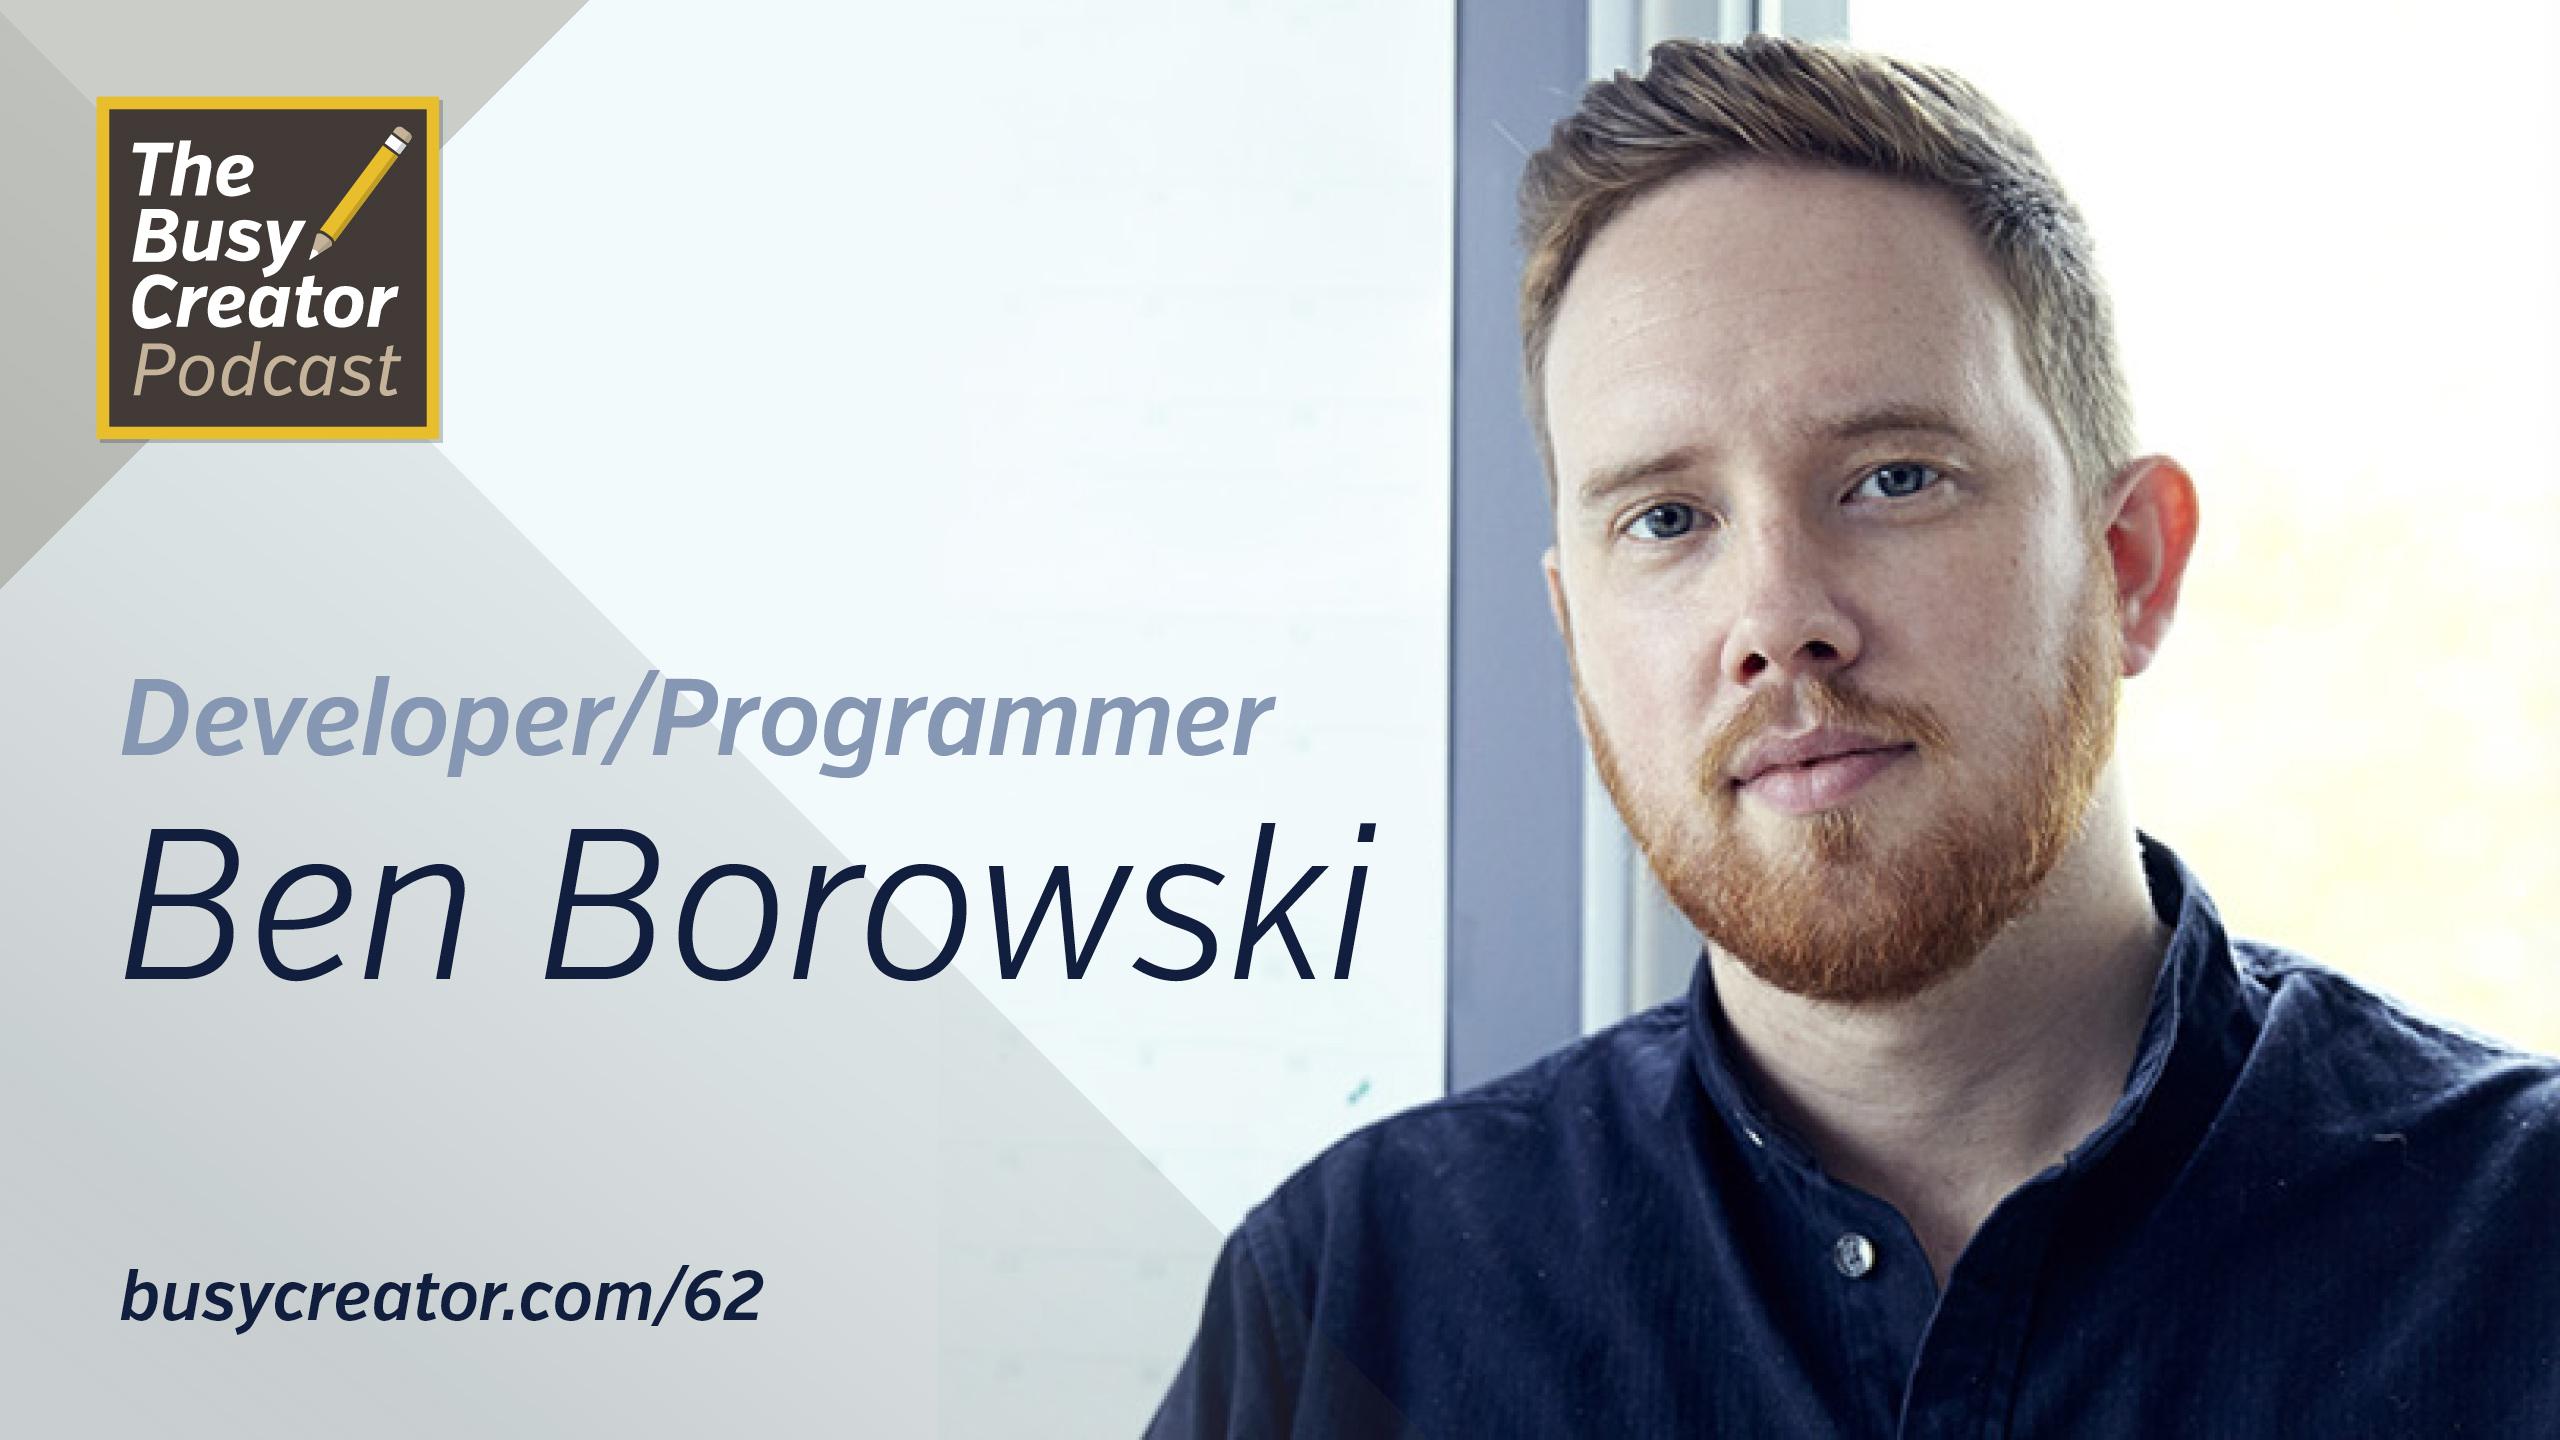 Programmer & Developer Ben Borowski Explores the Creative Side of Software